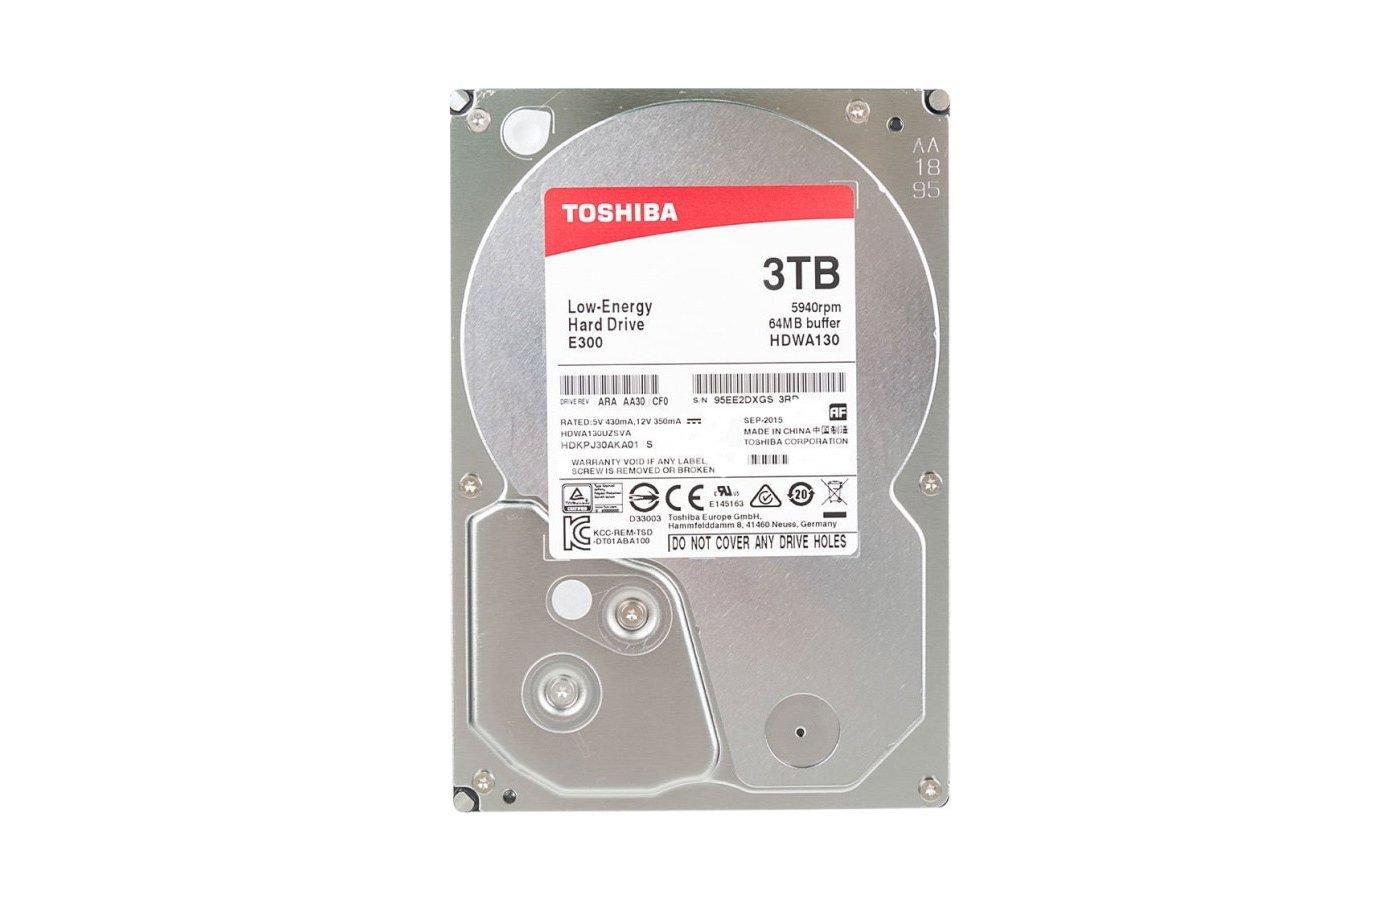 "Жесткий диск Toshiba SATA-III 3Tb HDWA130UZSVA E300 (5940rpm) 64Mb 3.5"""